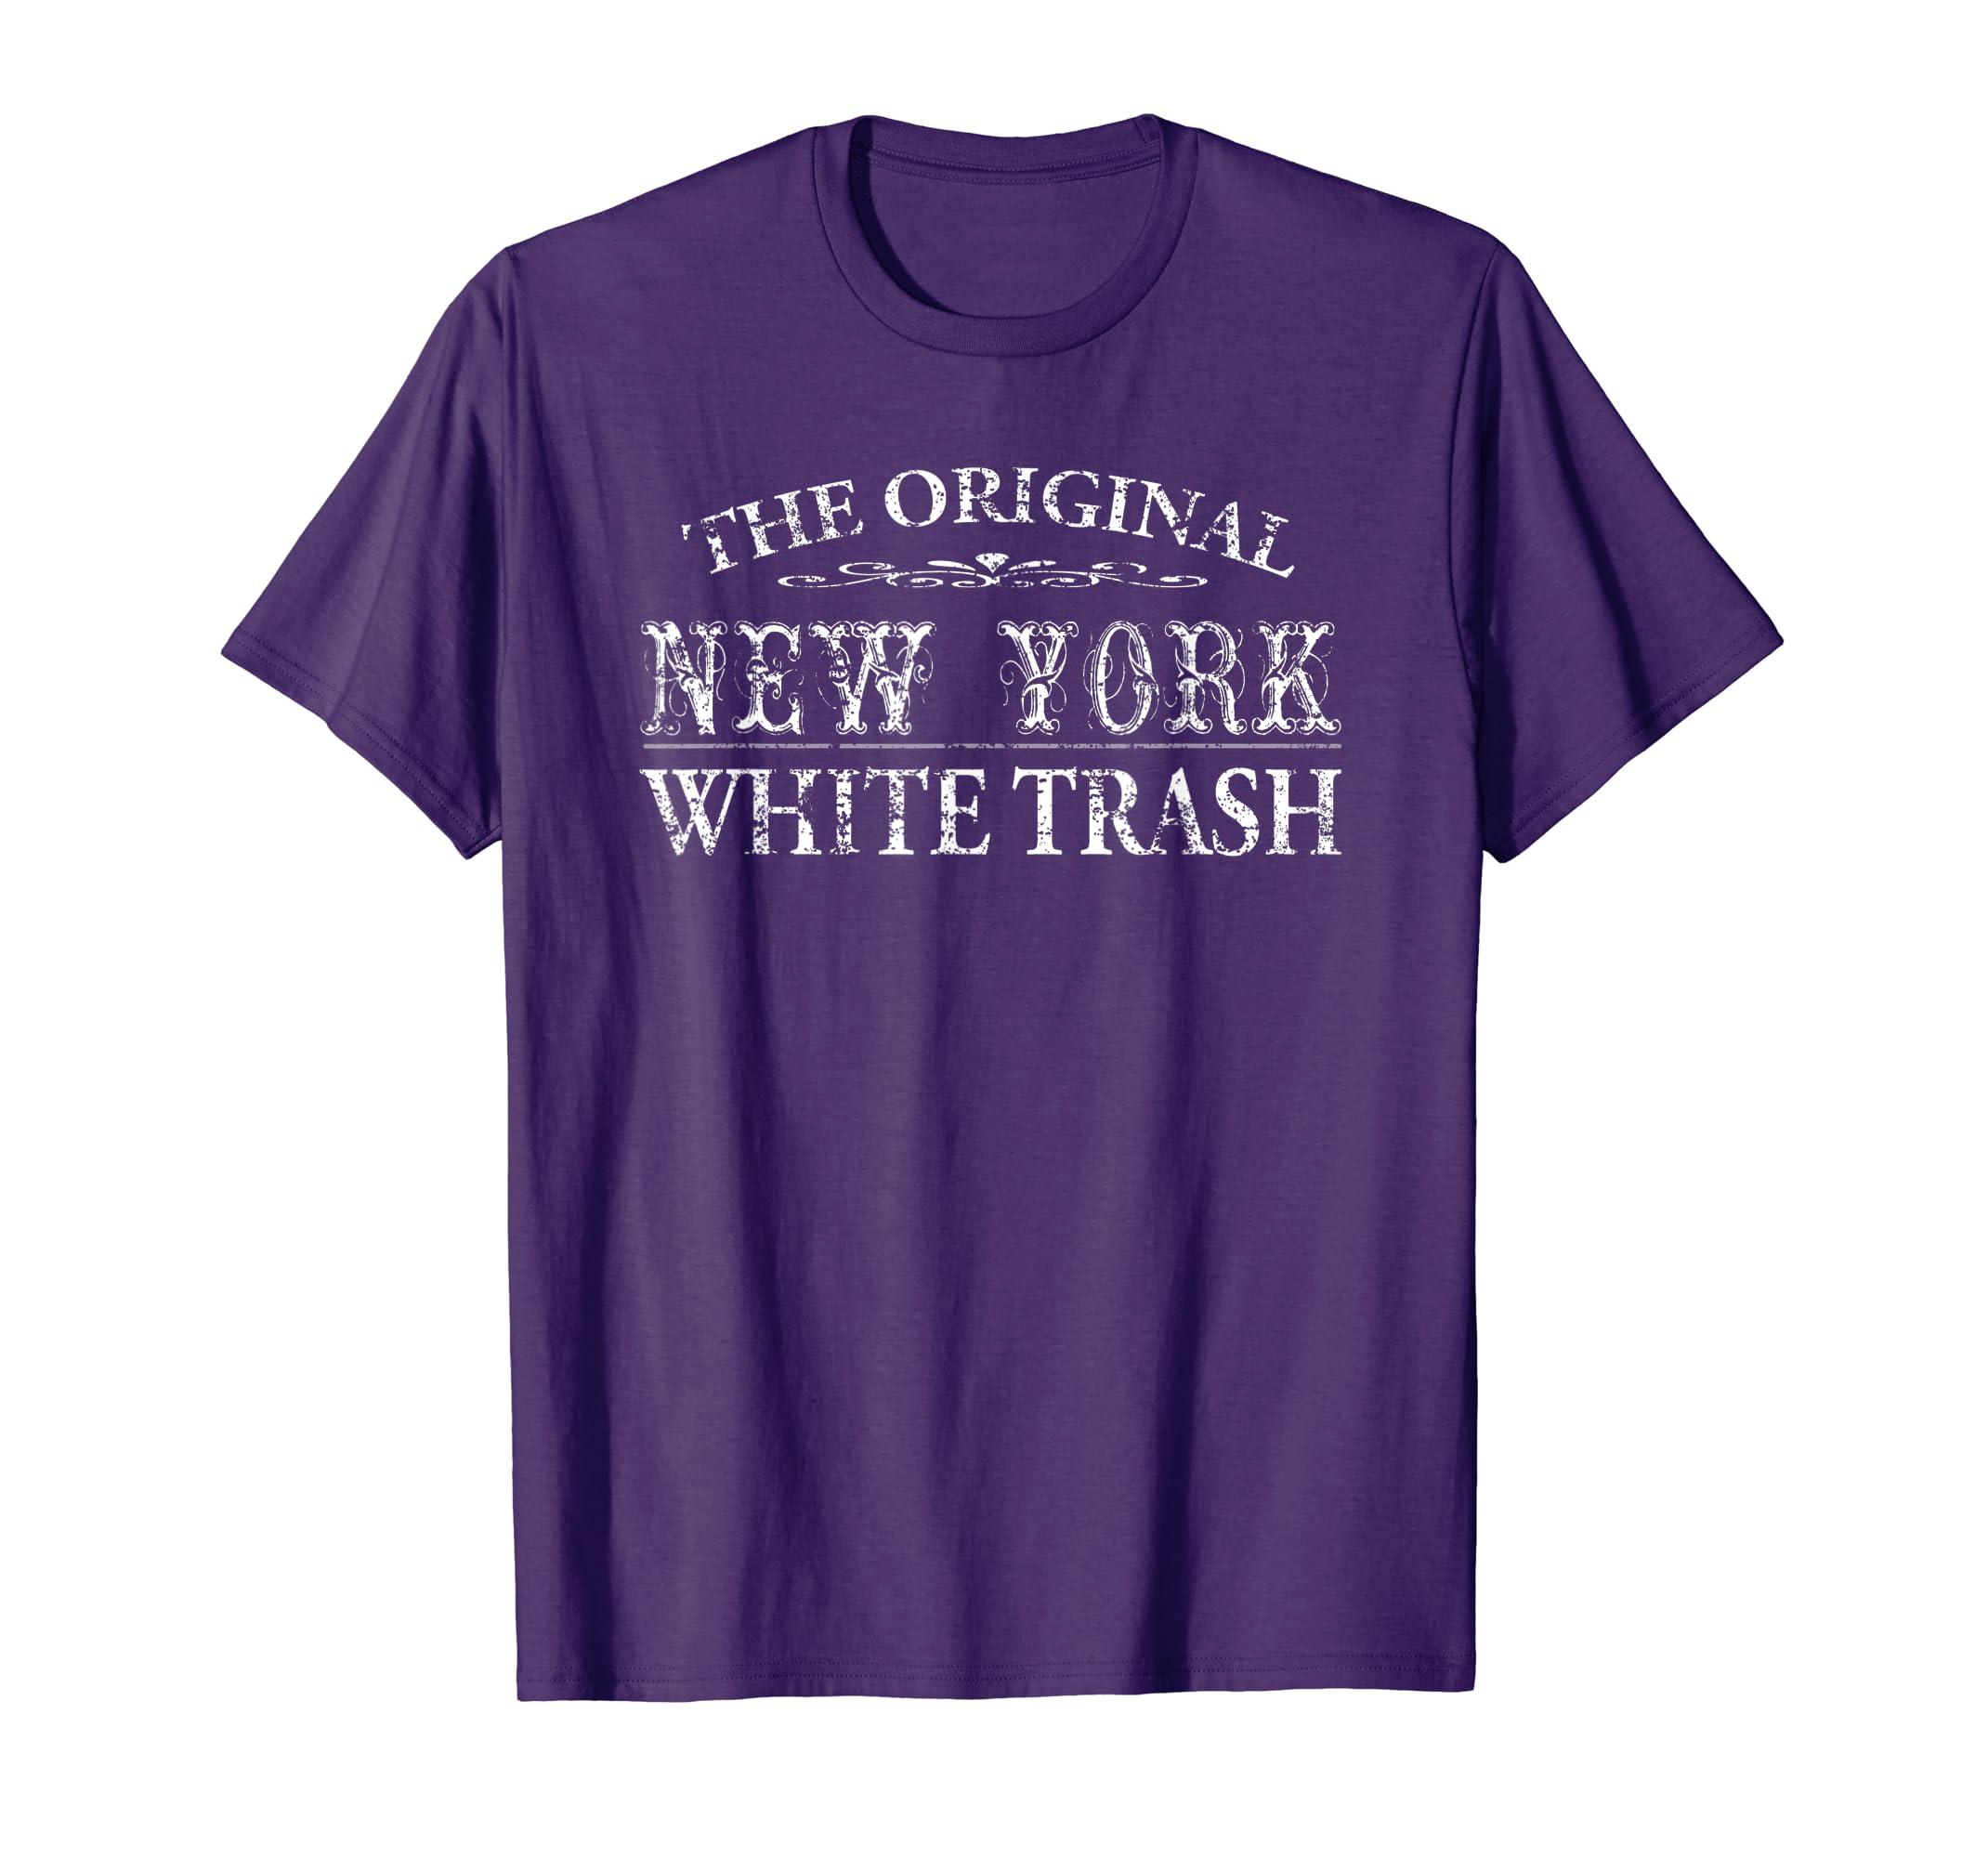 White trash violet